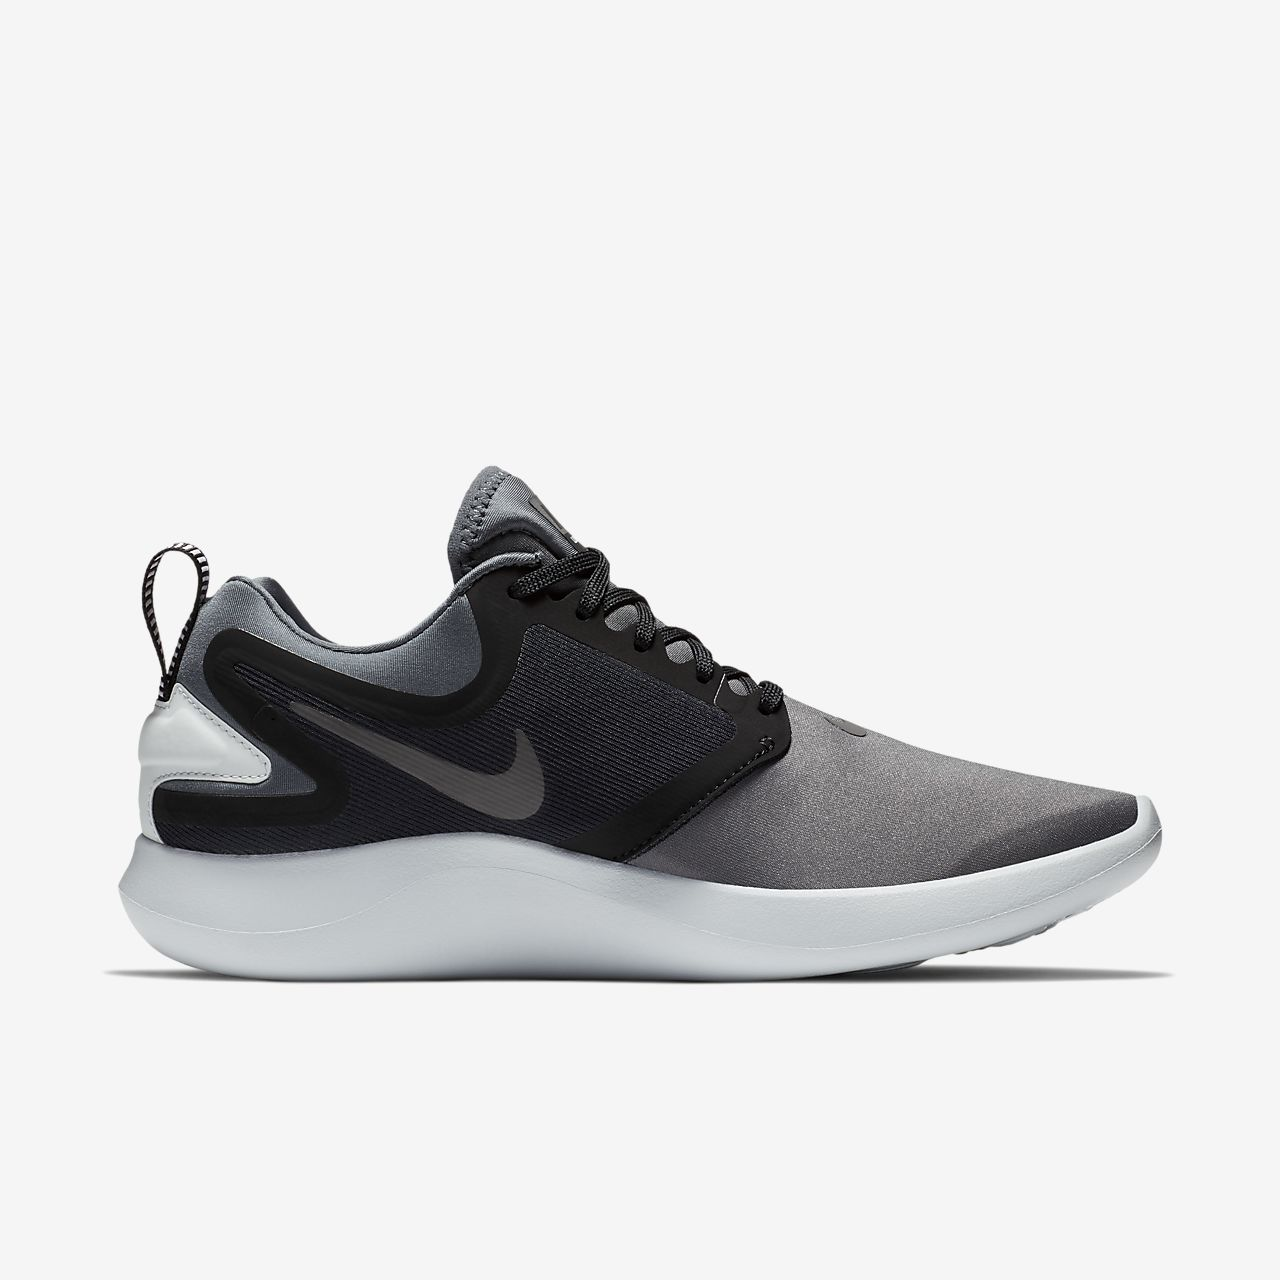 ... Chaussure de running Nike LunarSolo pour Femme